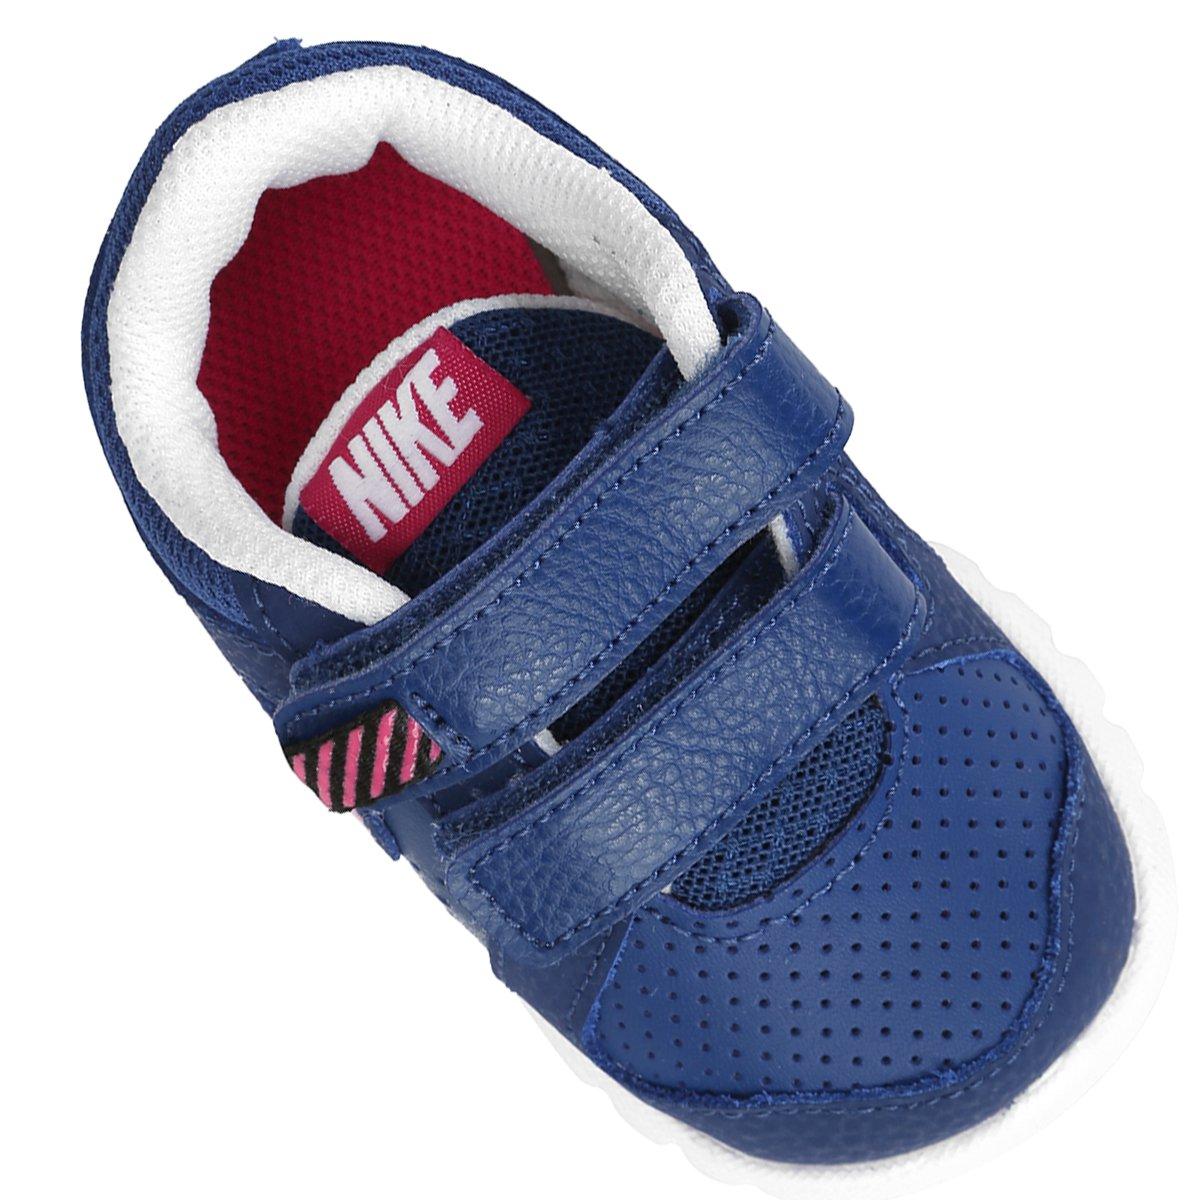 1b6cc1a3ff7 Tênis Nike Flex Experience Ltr Infantil - Compre Agora